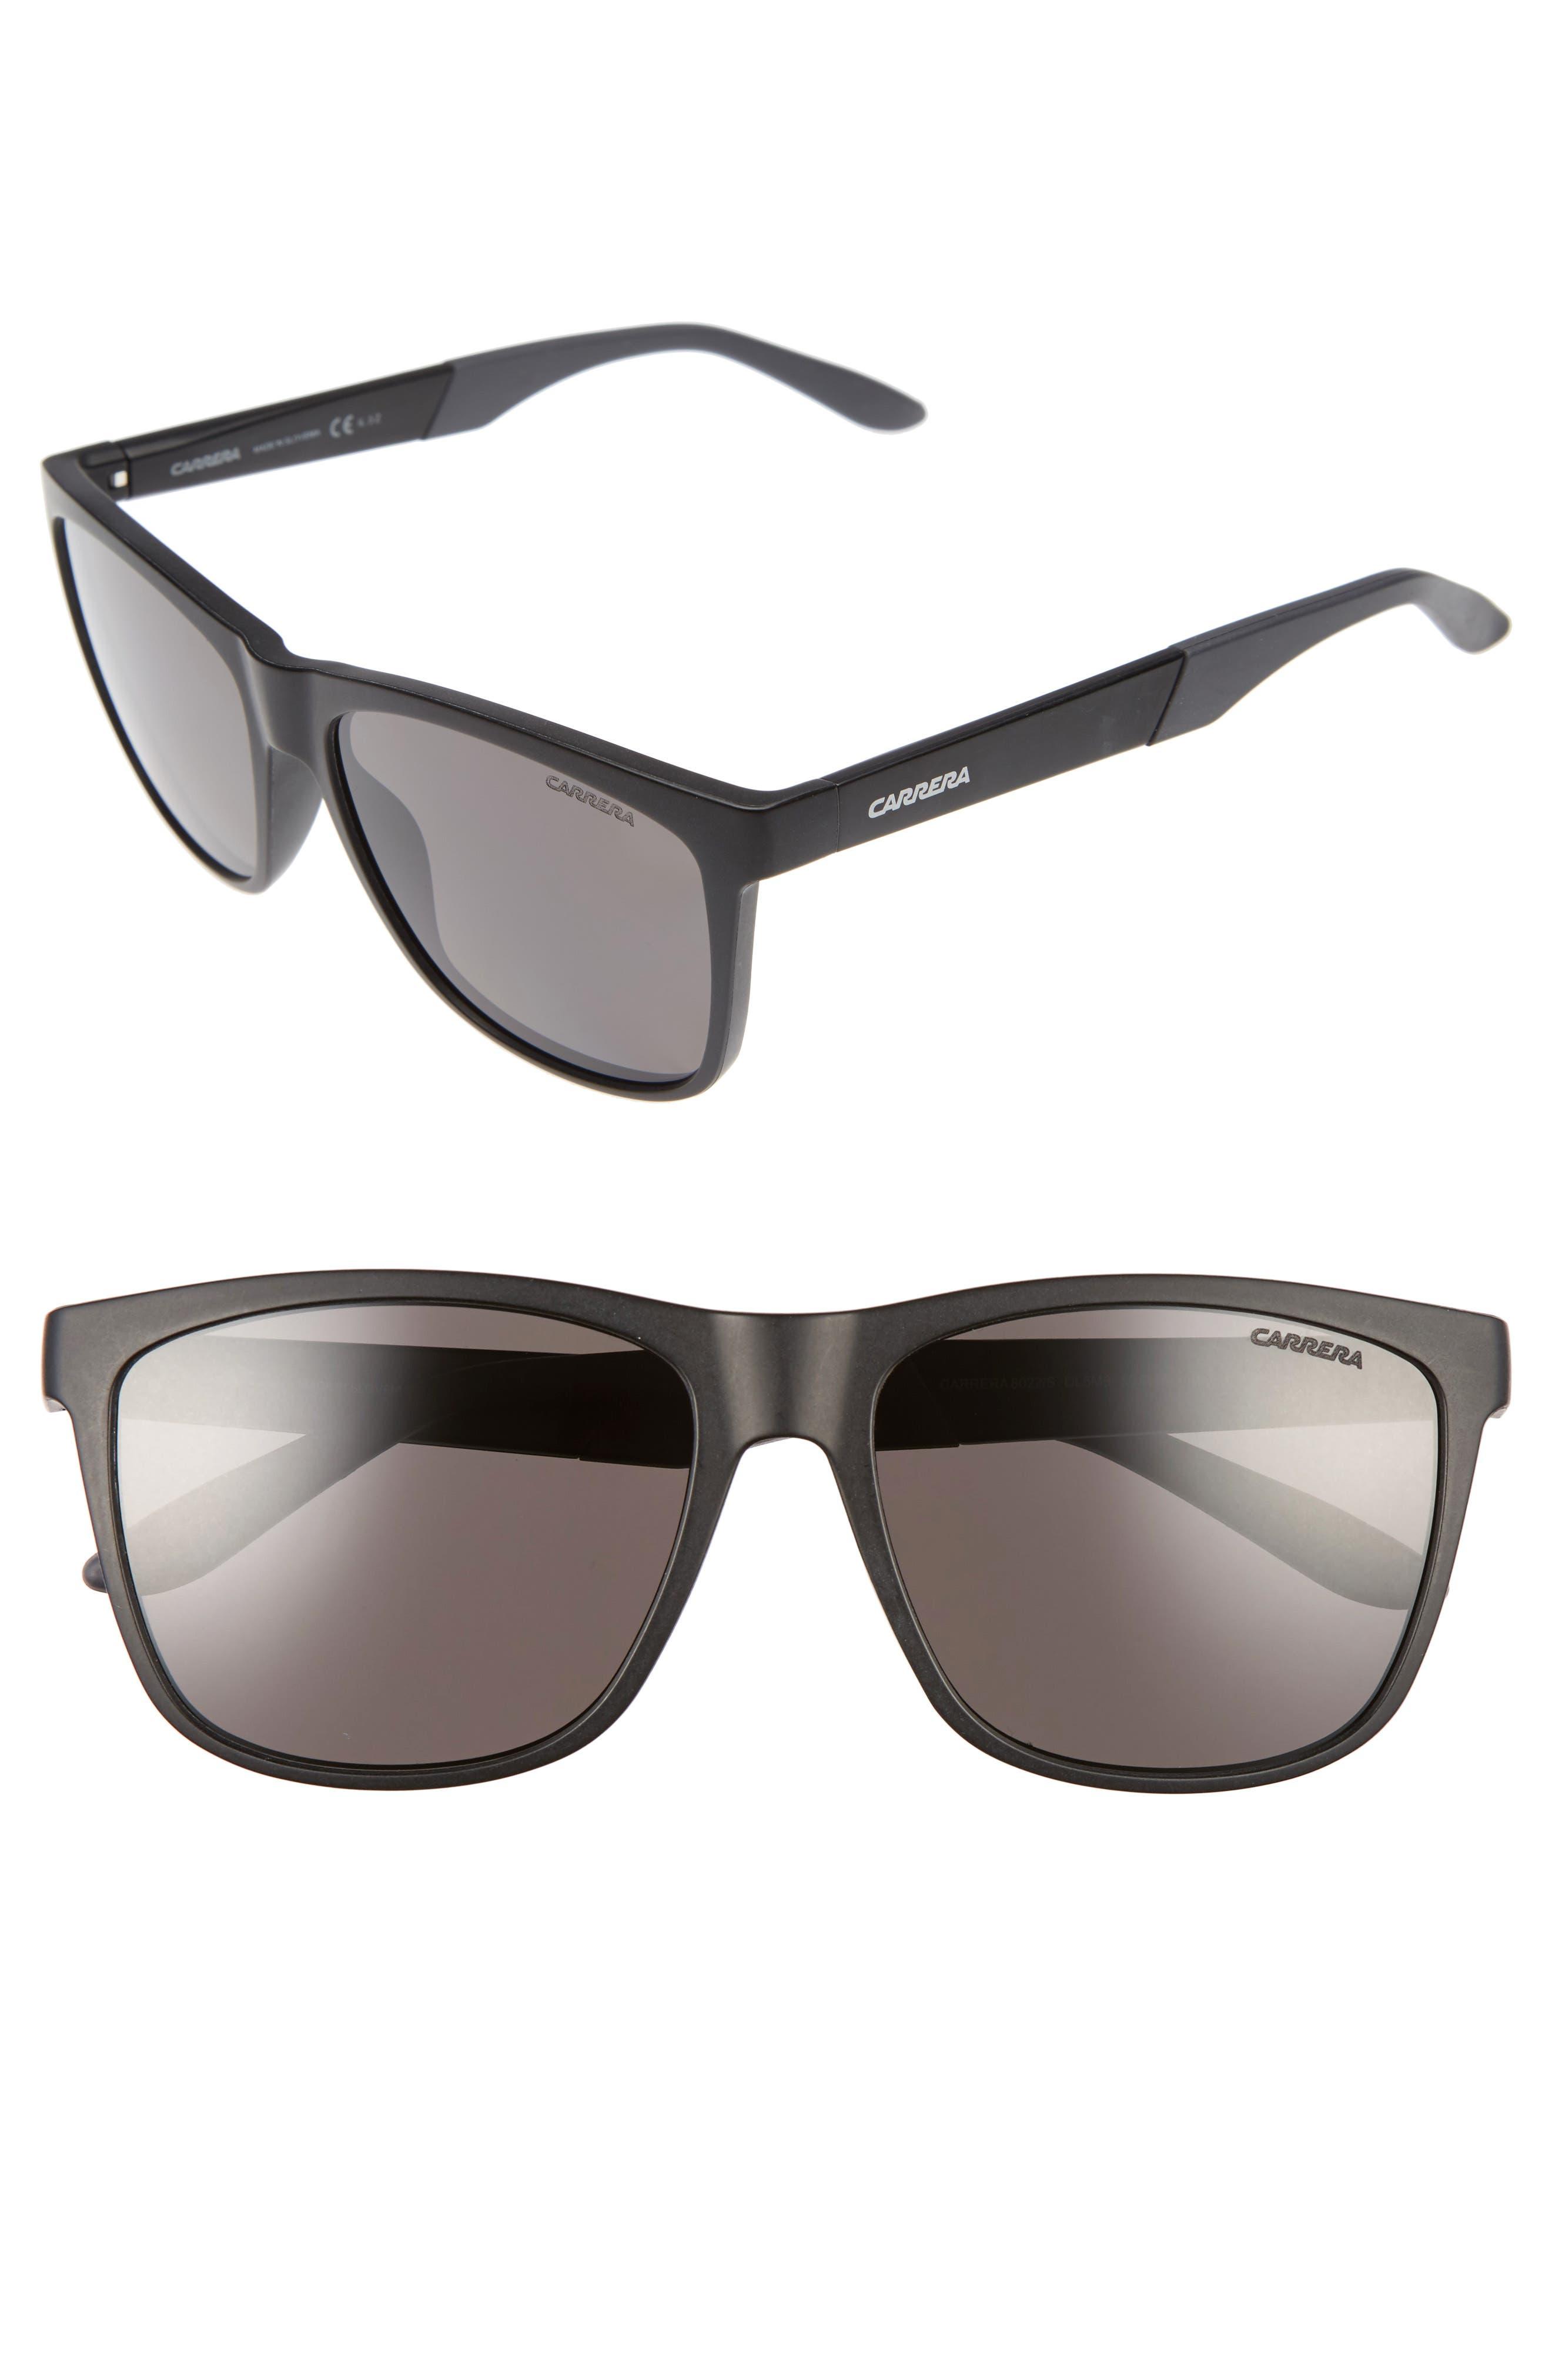 Carrera Eyewear 8022/s 5m Polarized Sunglasses -